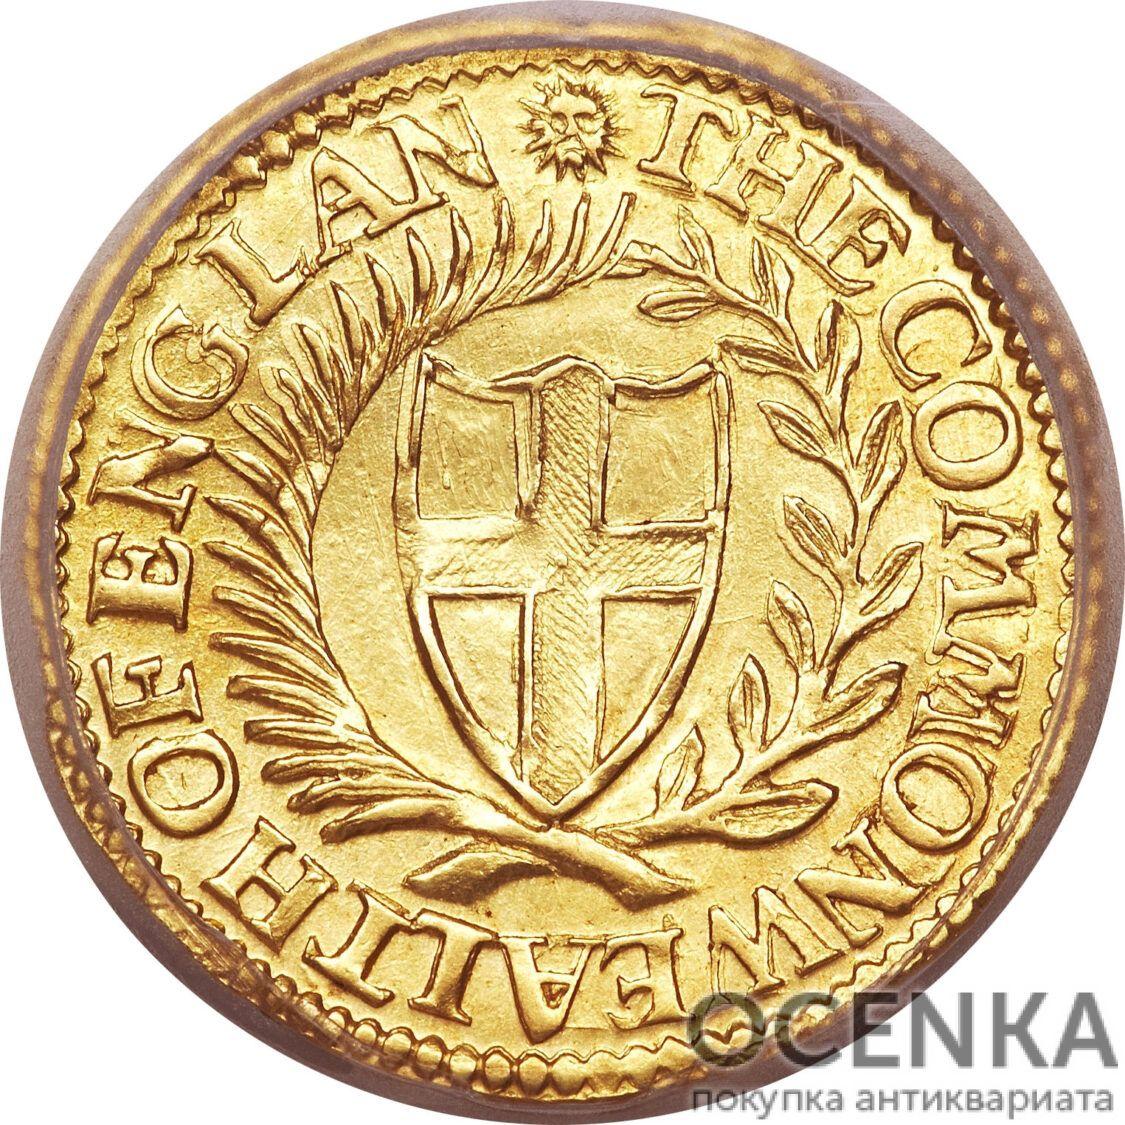 Золотая монета 1 Crown (крона) Великобритания - 10